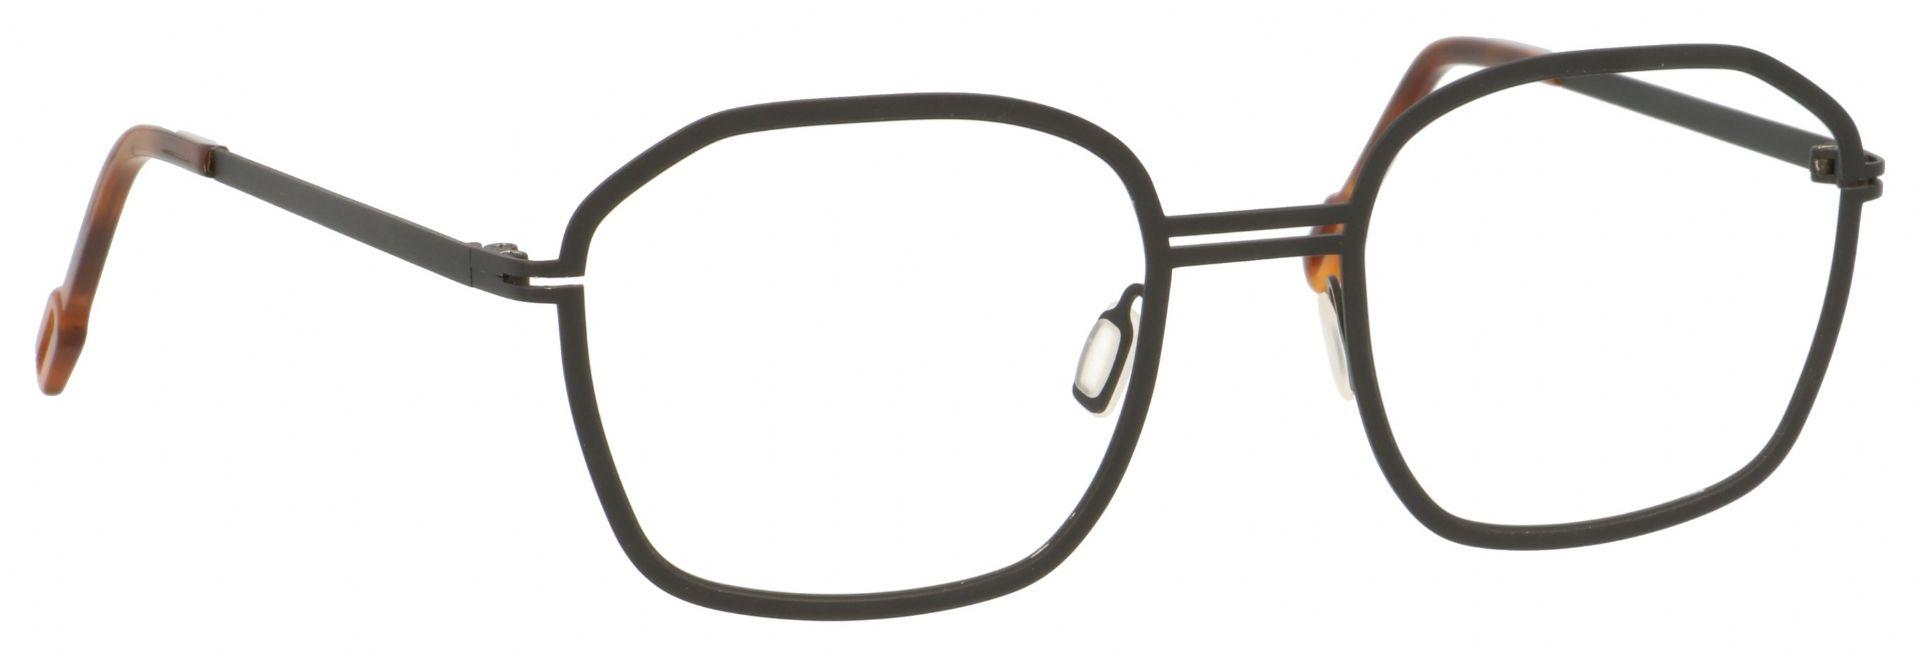 Fineburg M102 // Odette Lunettes